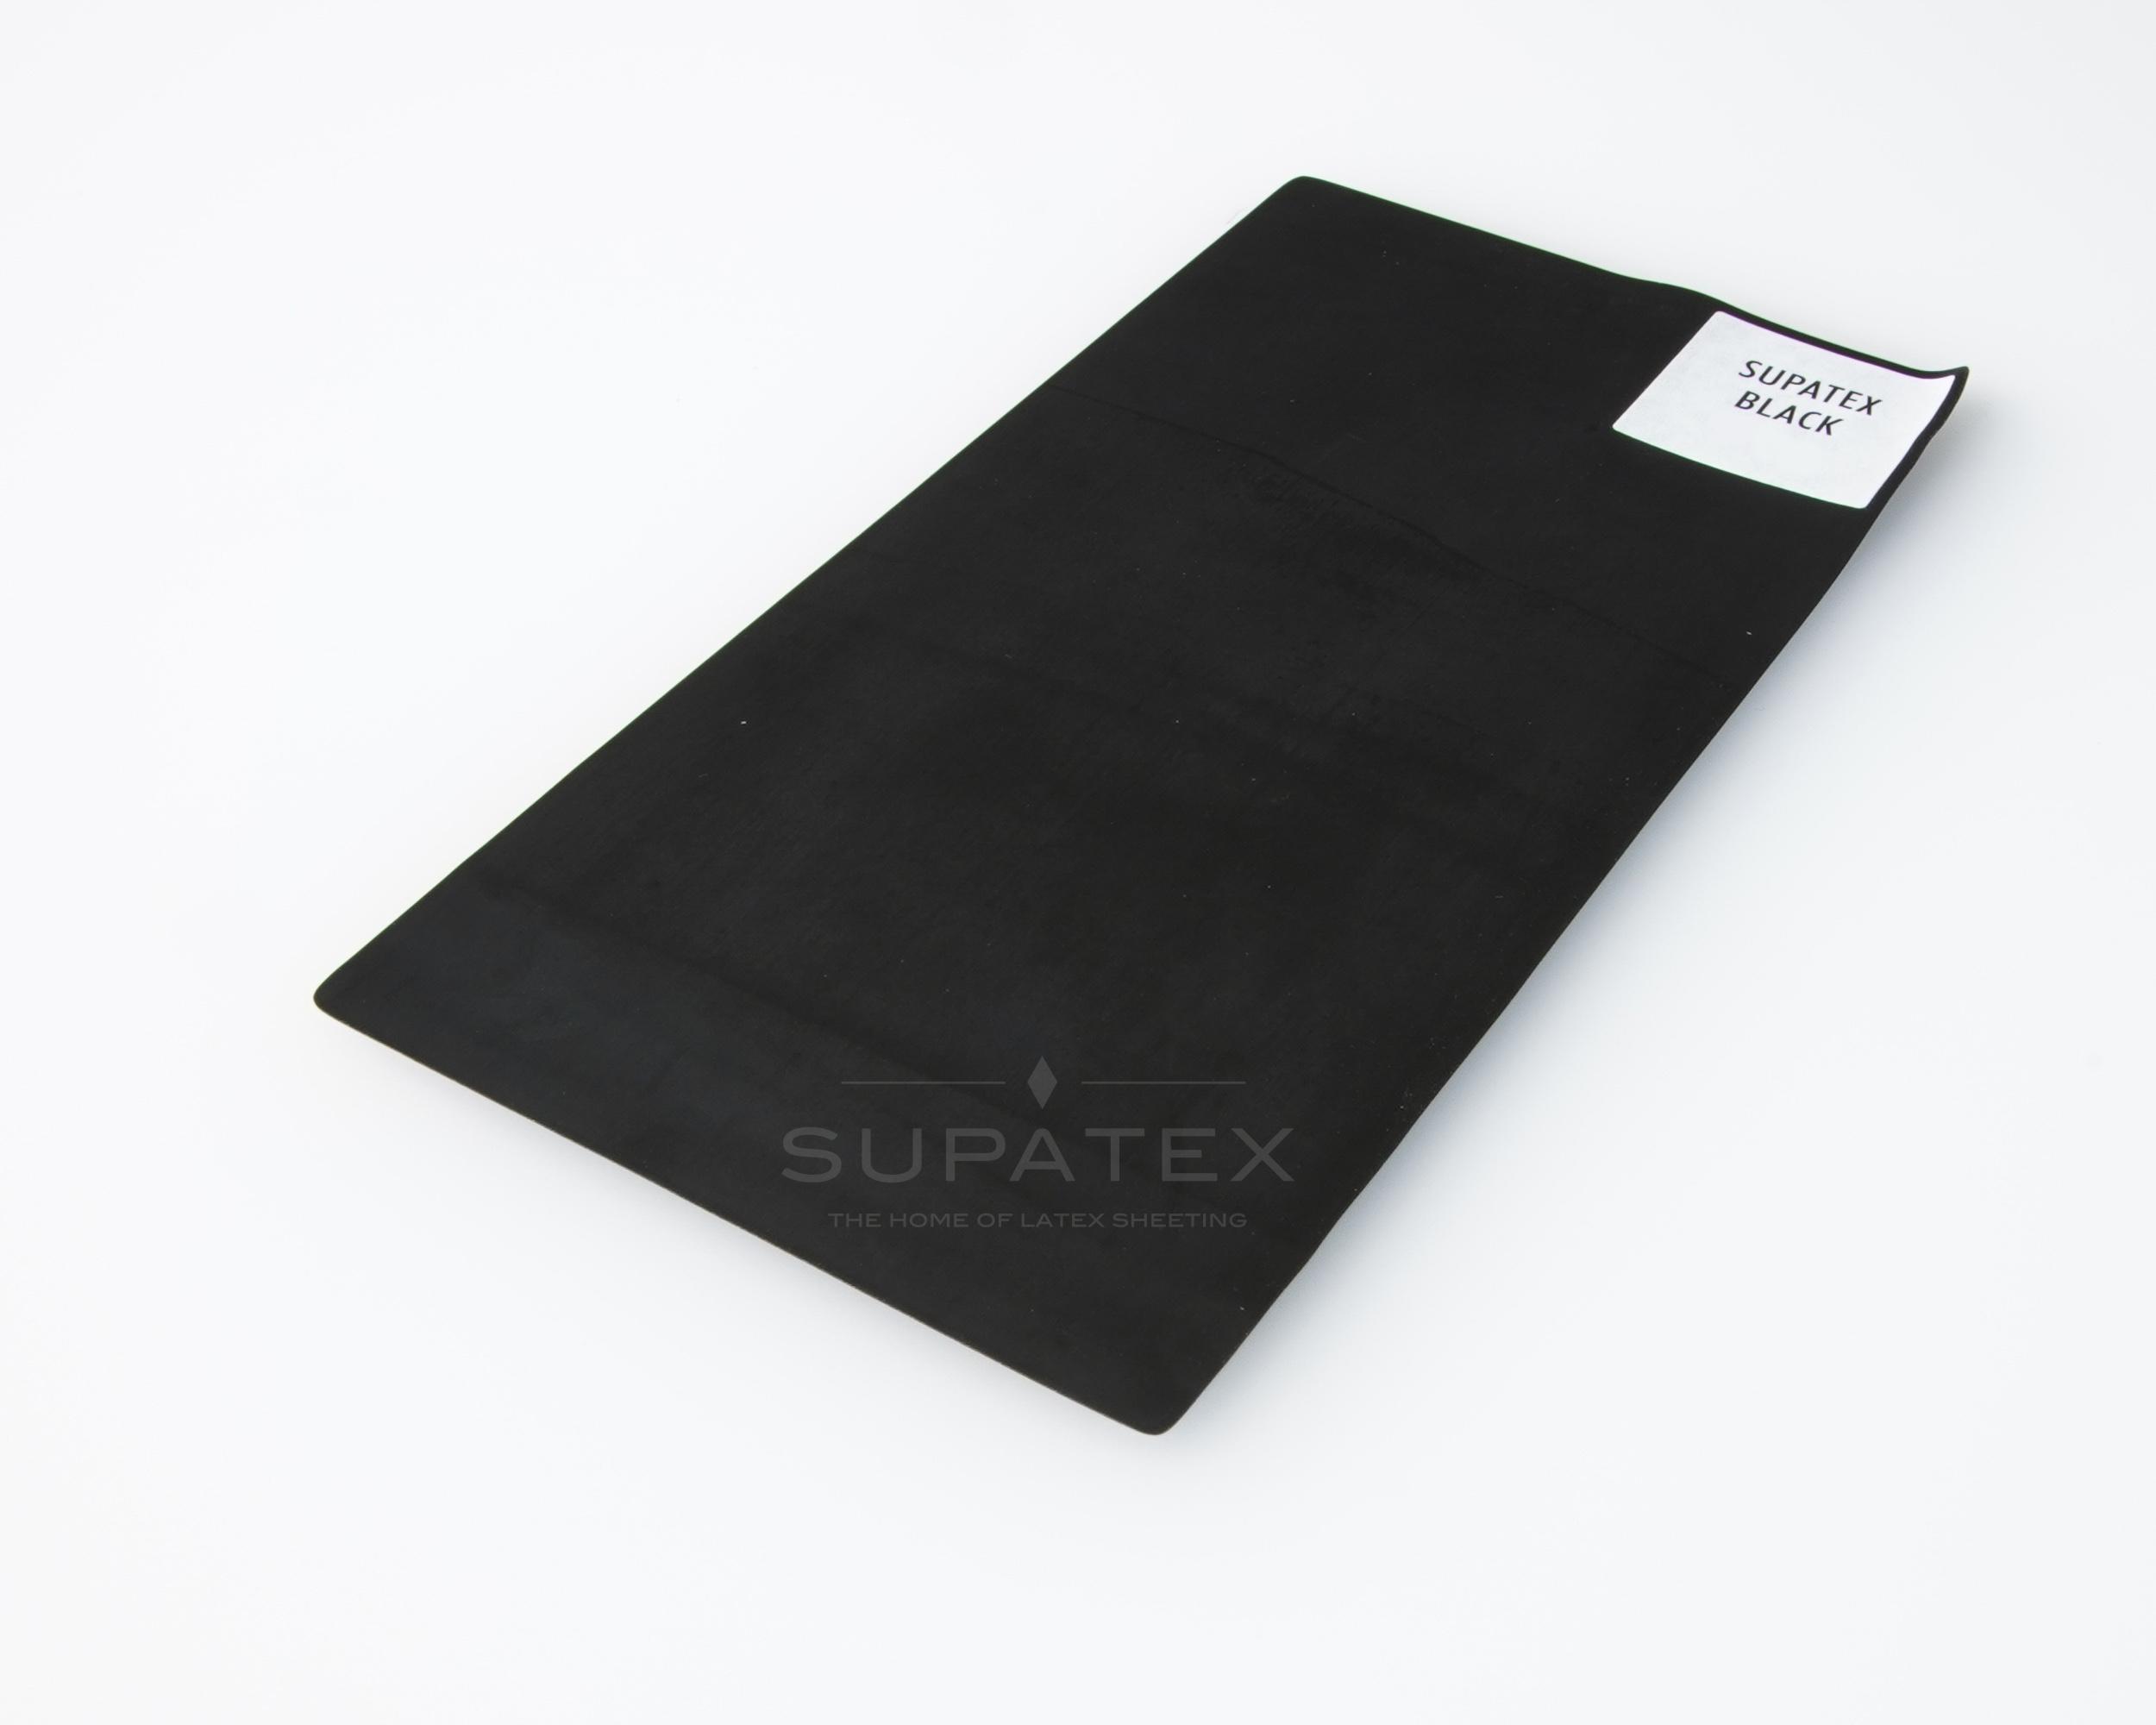 Supatex Black 0.80 mm